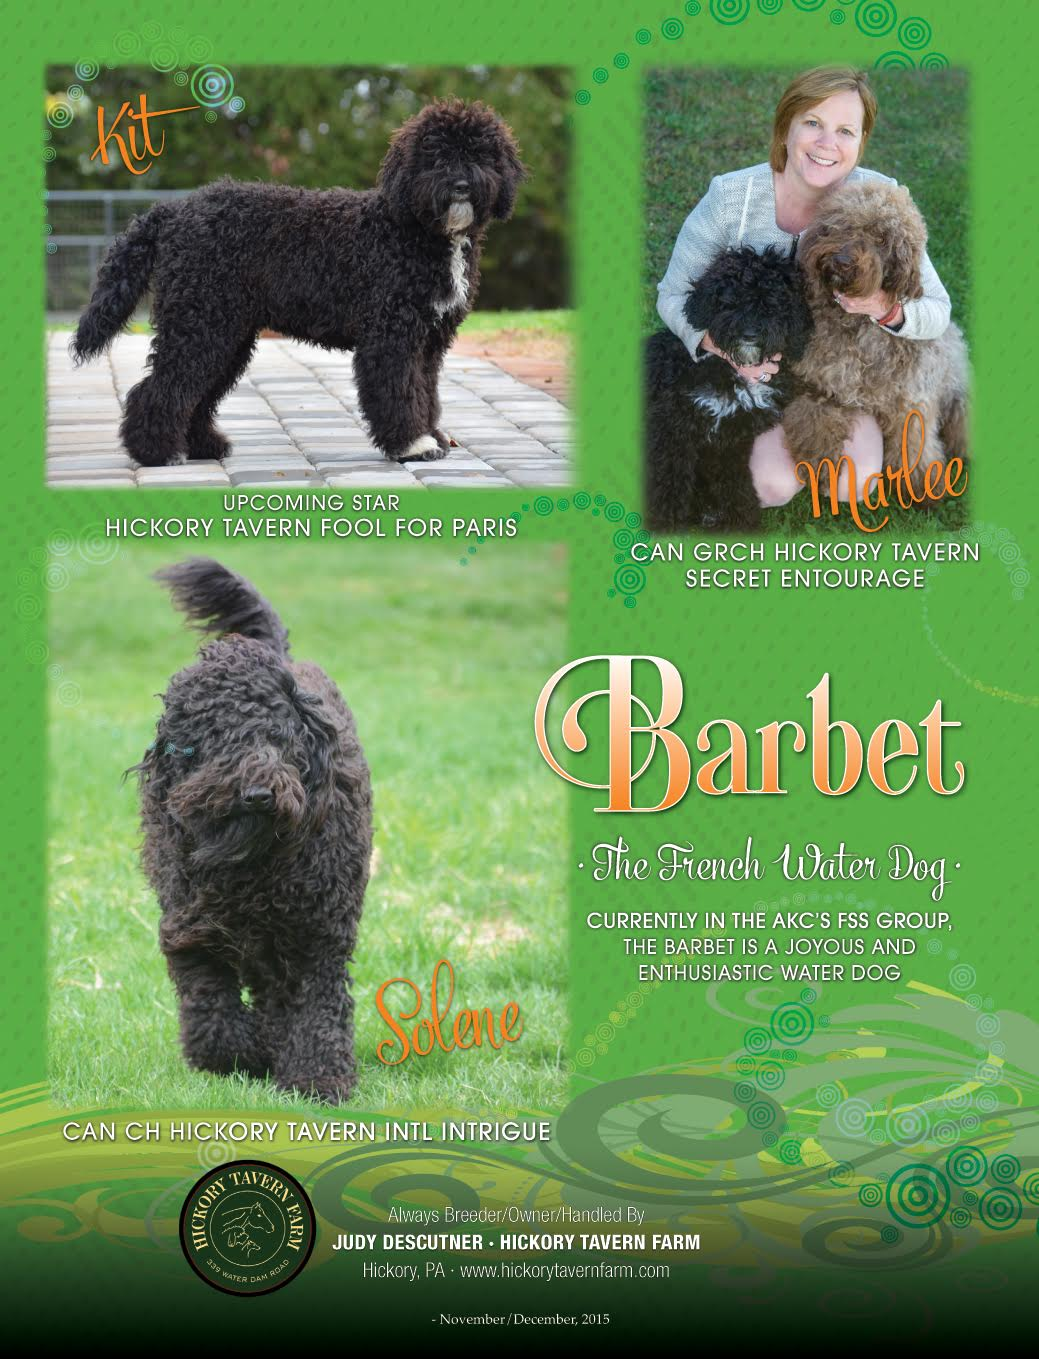 Hickory Tavern Farm Barbet: Canine Chronicle Ad Nov/Dec 2015 - photo#42